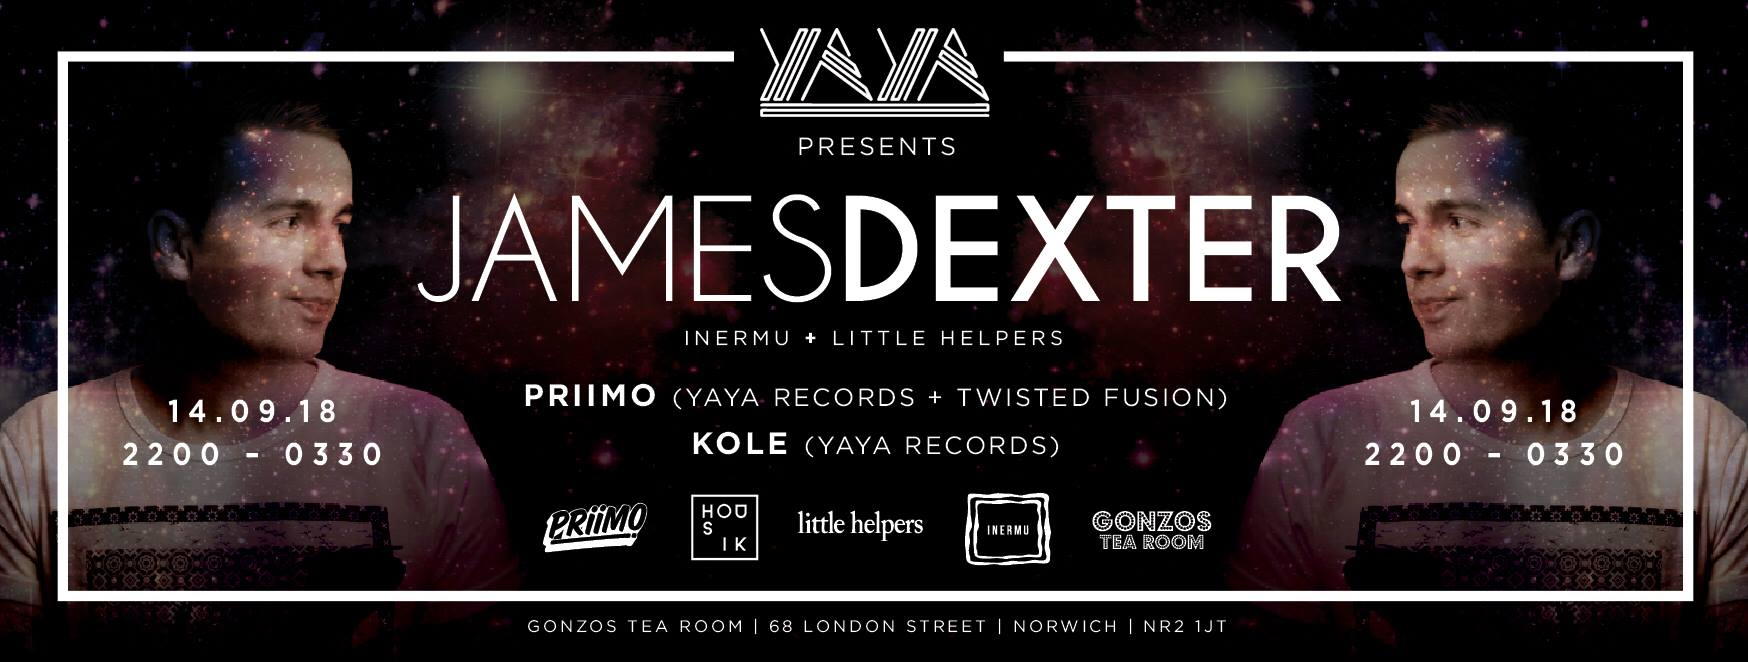 James-dexter-yaya-records-label-norwich-london-inermu-gonzos-dj-producer-artist.jpg